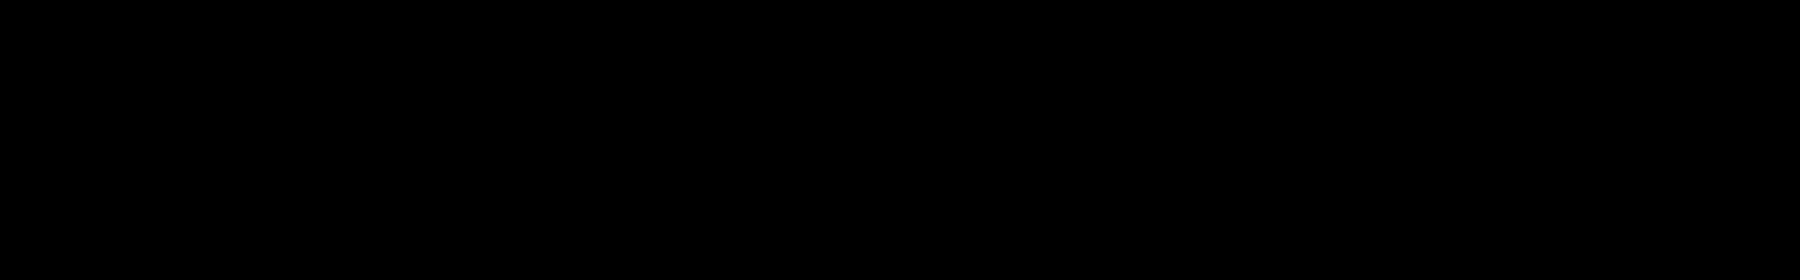 Luna - Score audio waveform